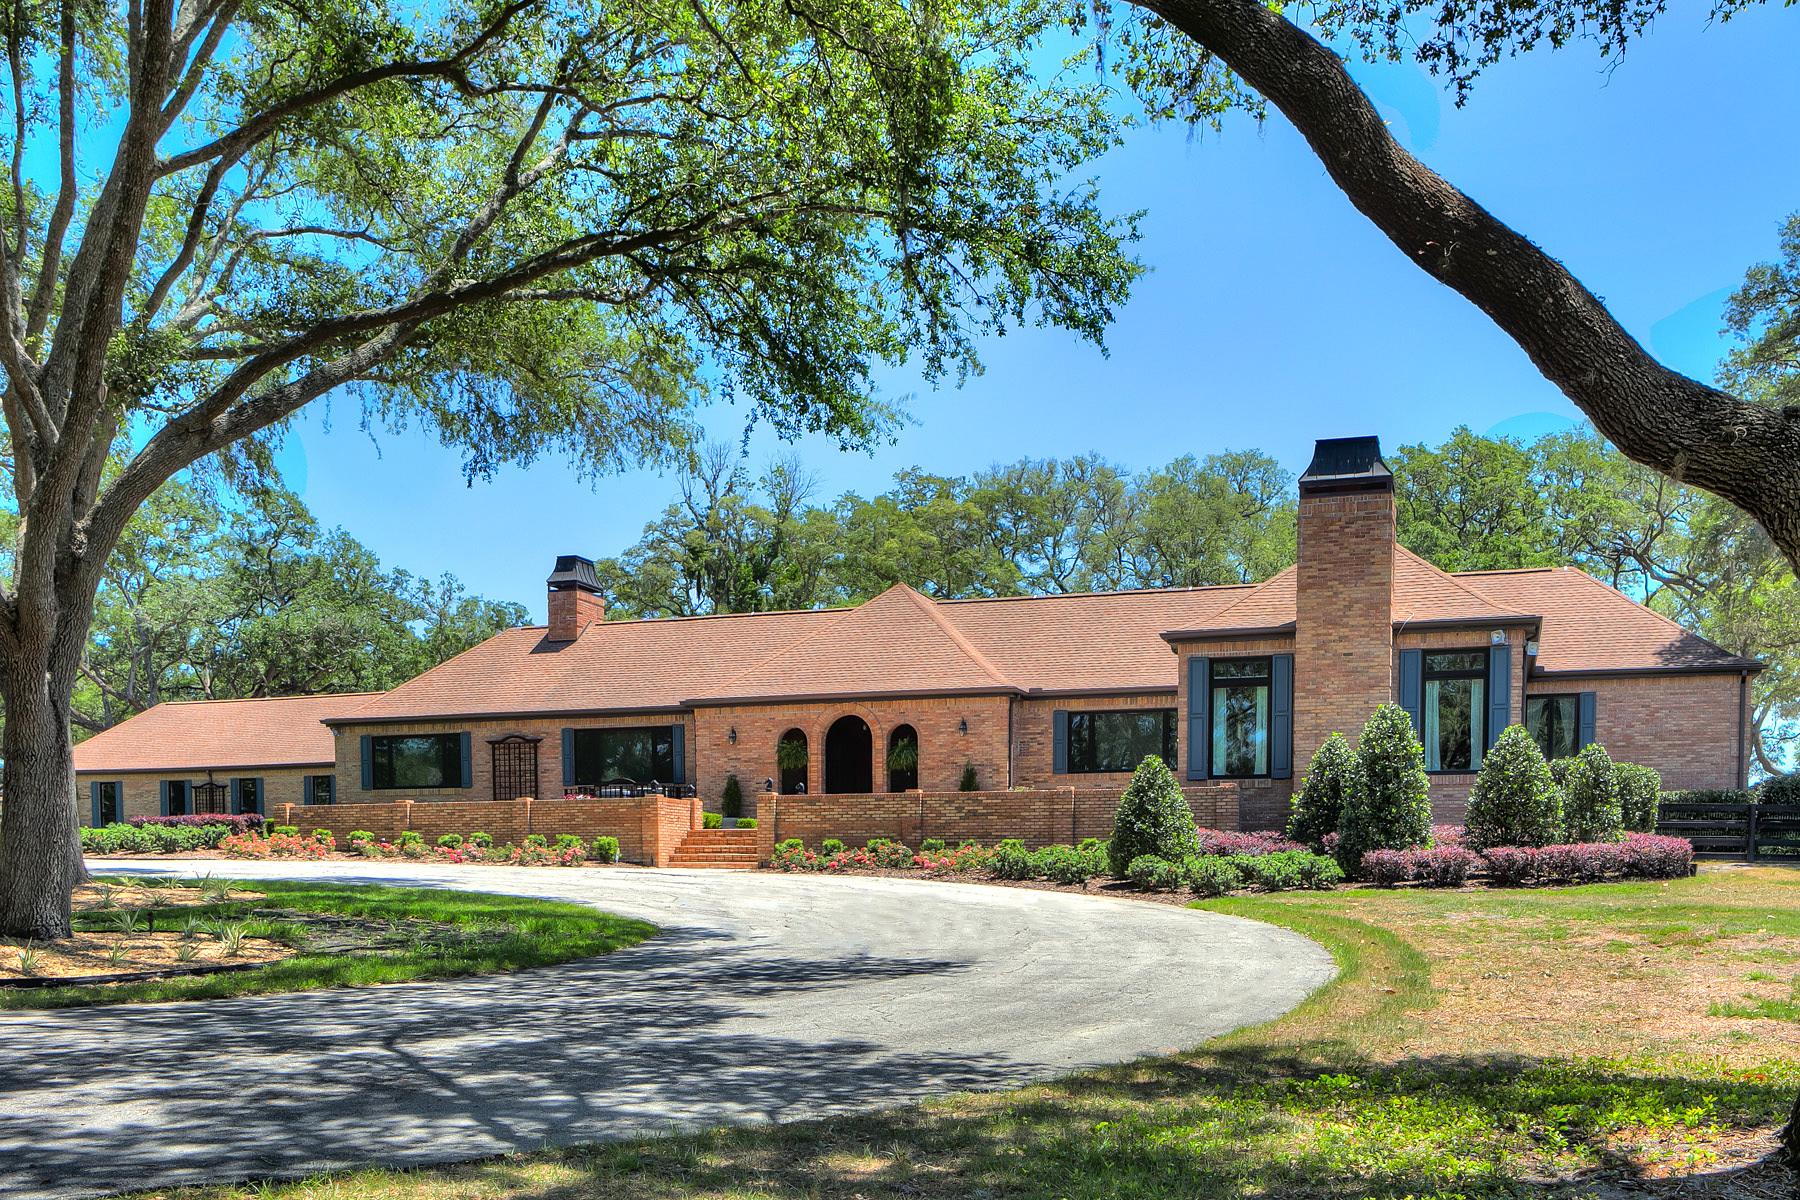 45 Acre Luxury Farm on Millionaire's Row